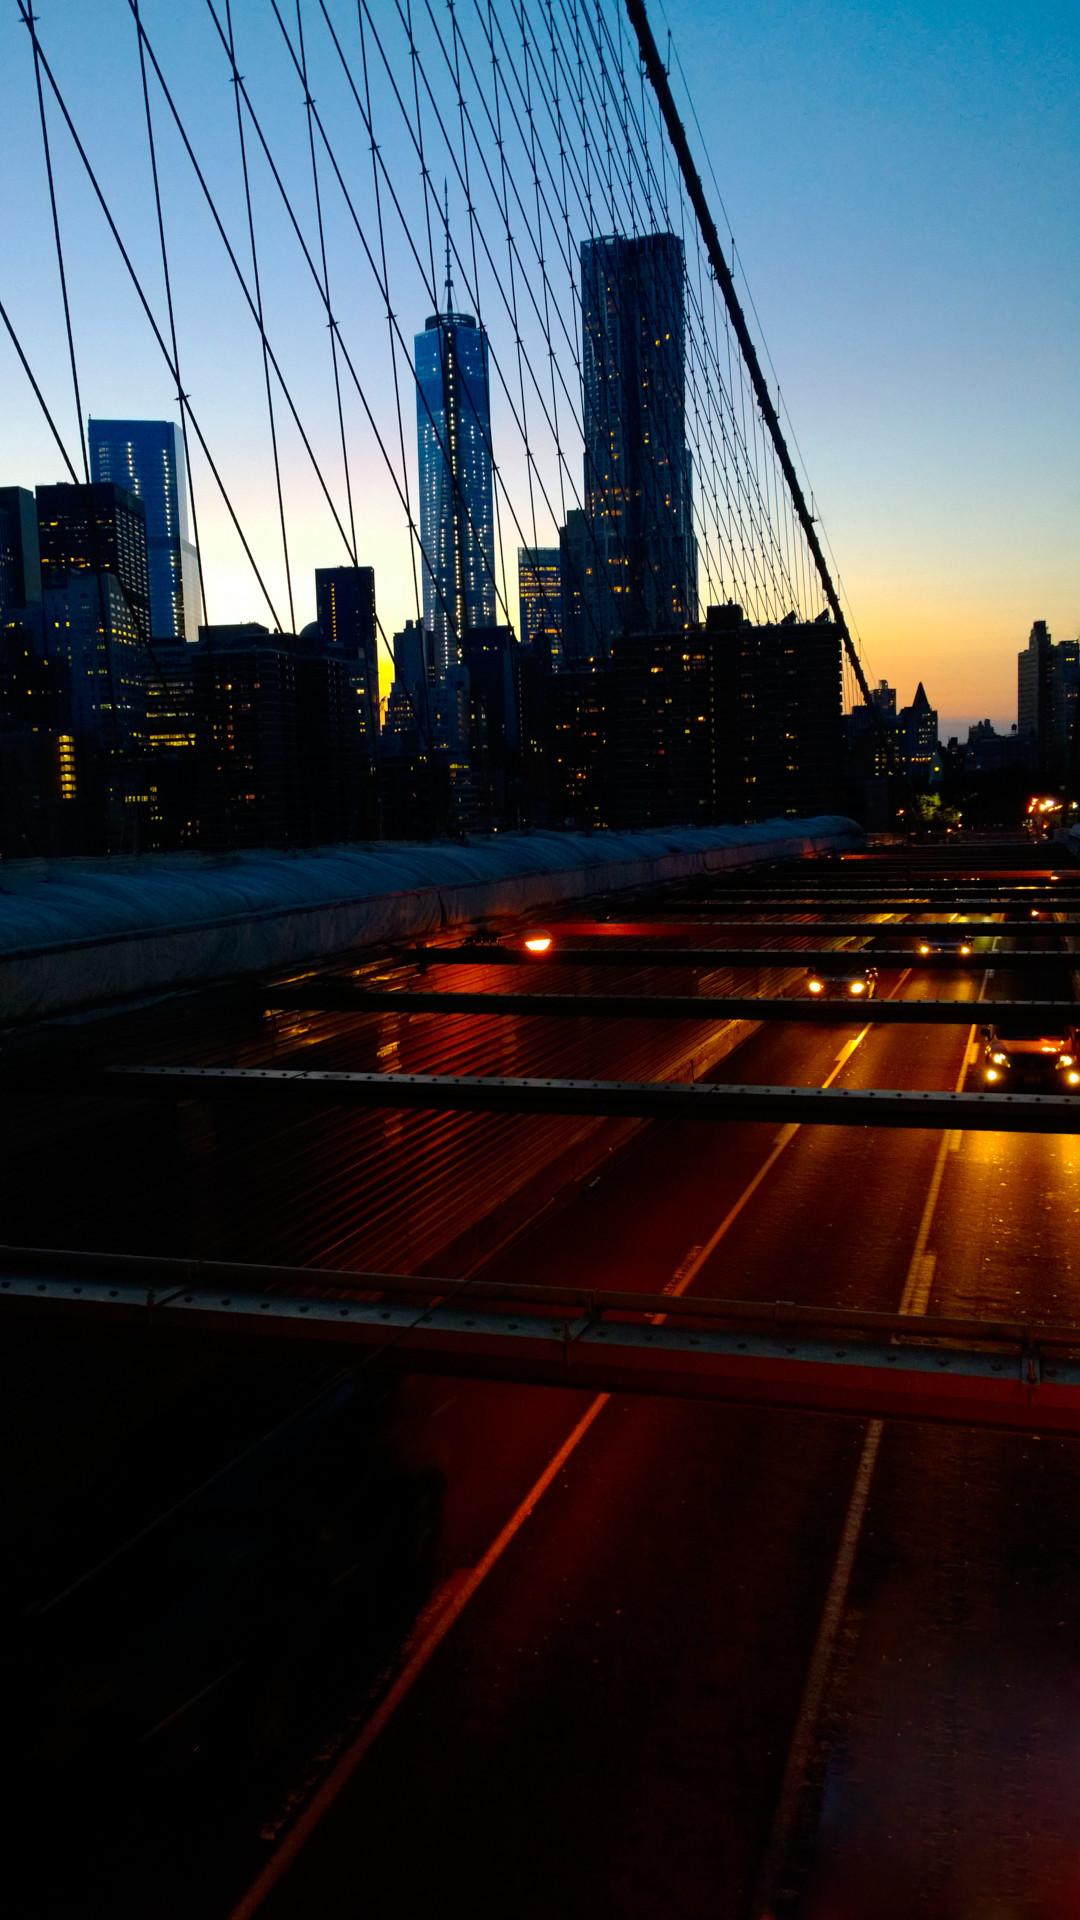 City Night Lockscreen iPhone 6 Plus HD Wallpaper …